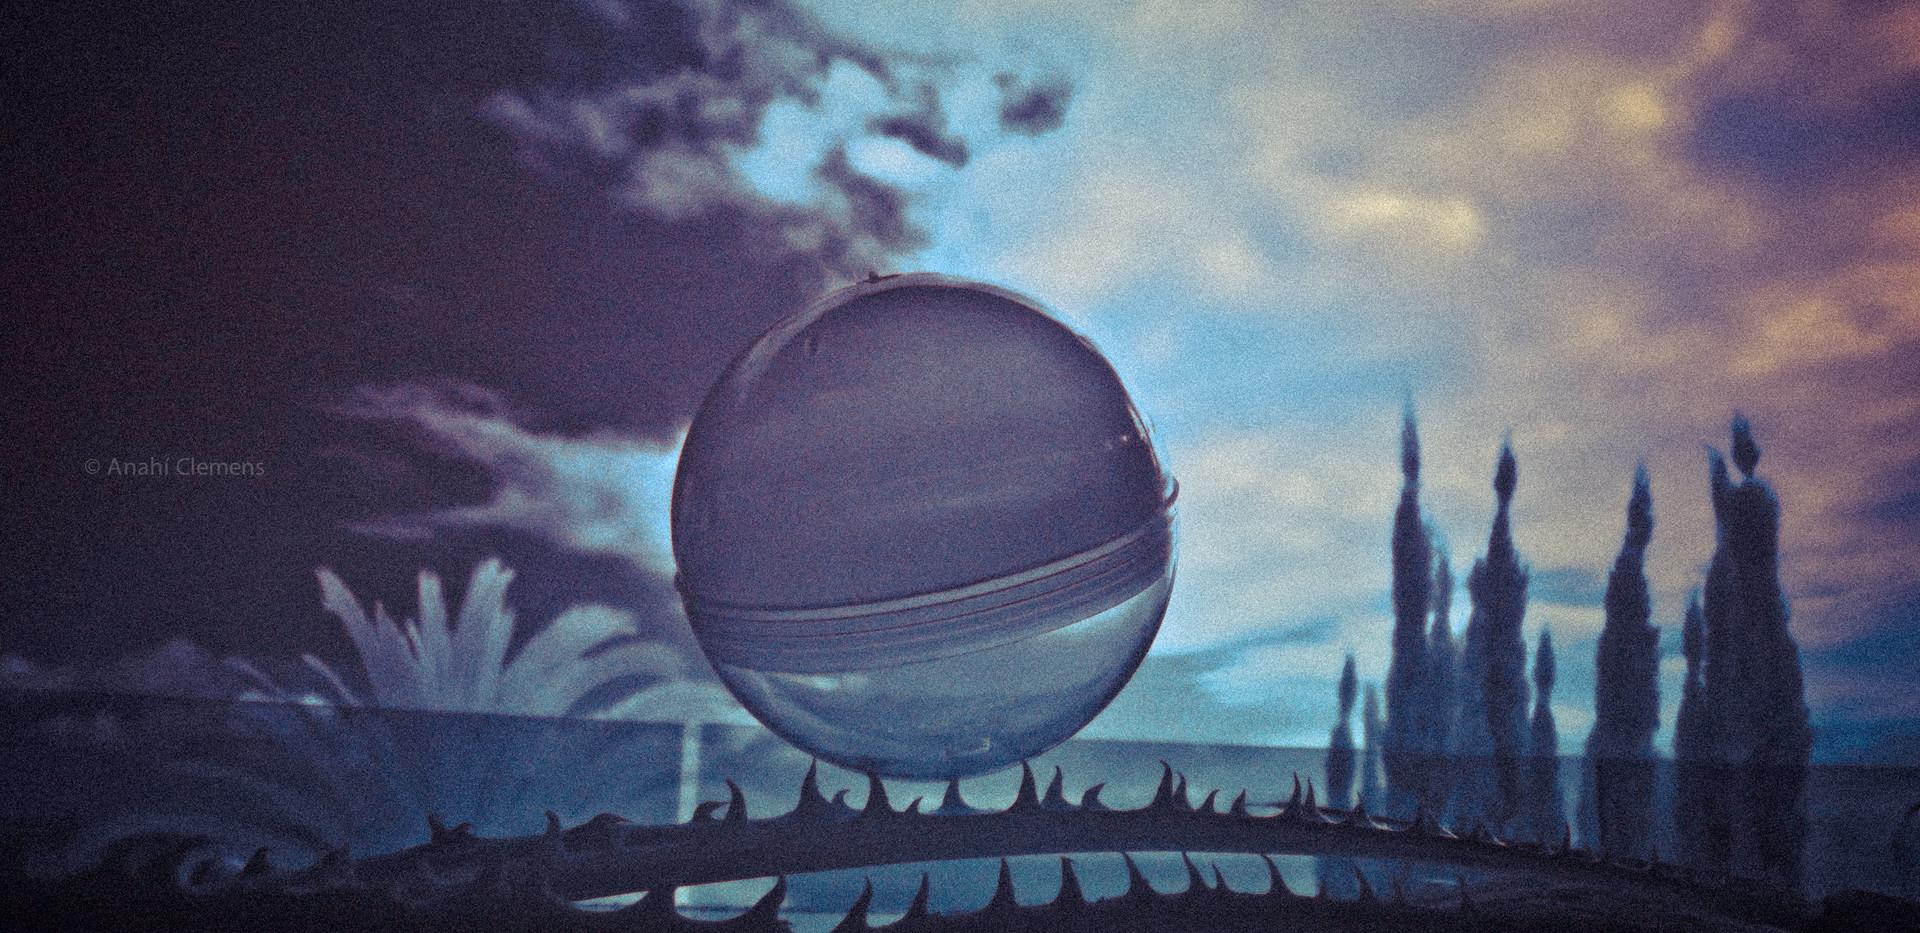 Neon-surrealworlds-anahiclemens-smallver